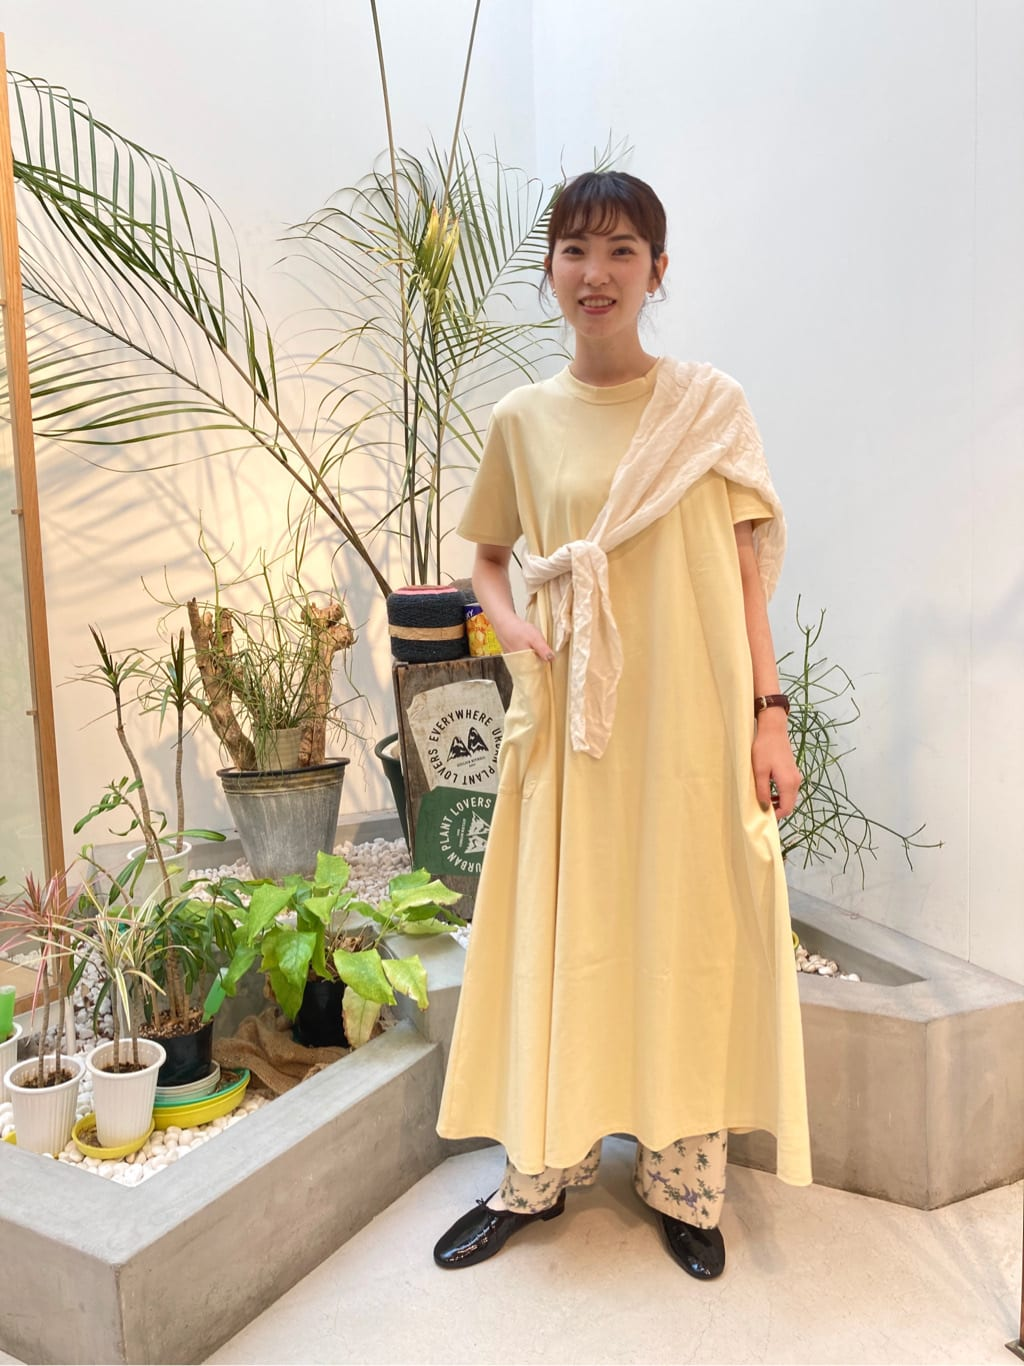 l'atelier du savon 名古屋栄路面 身長:161cm 2021.08.18